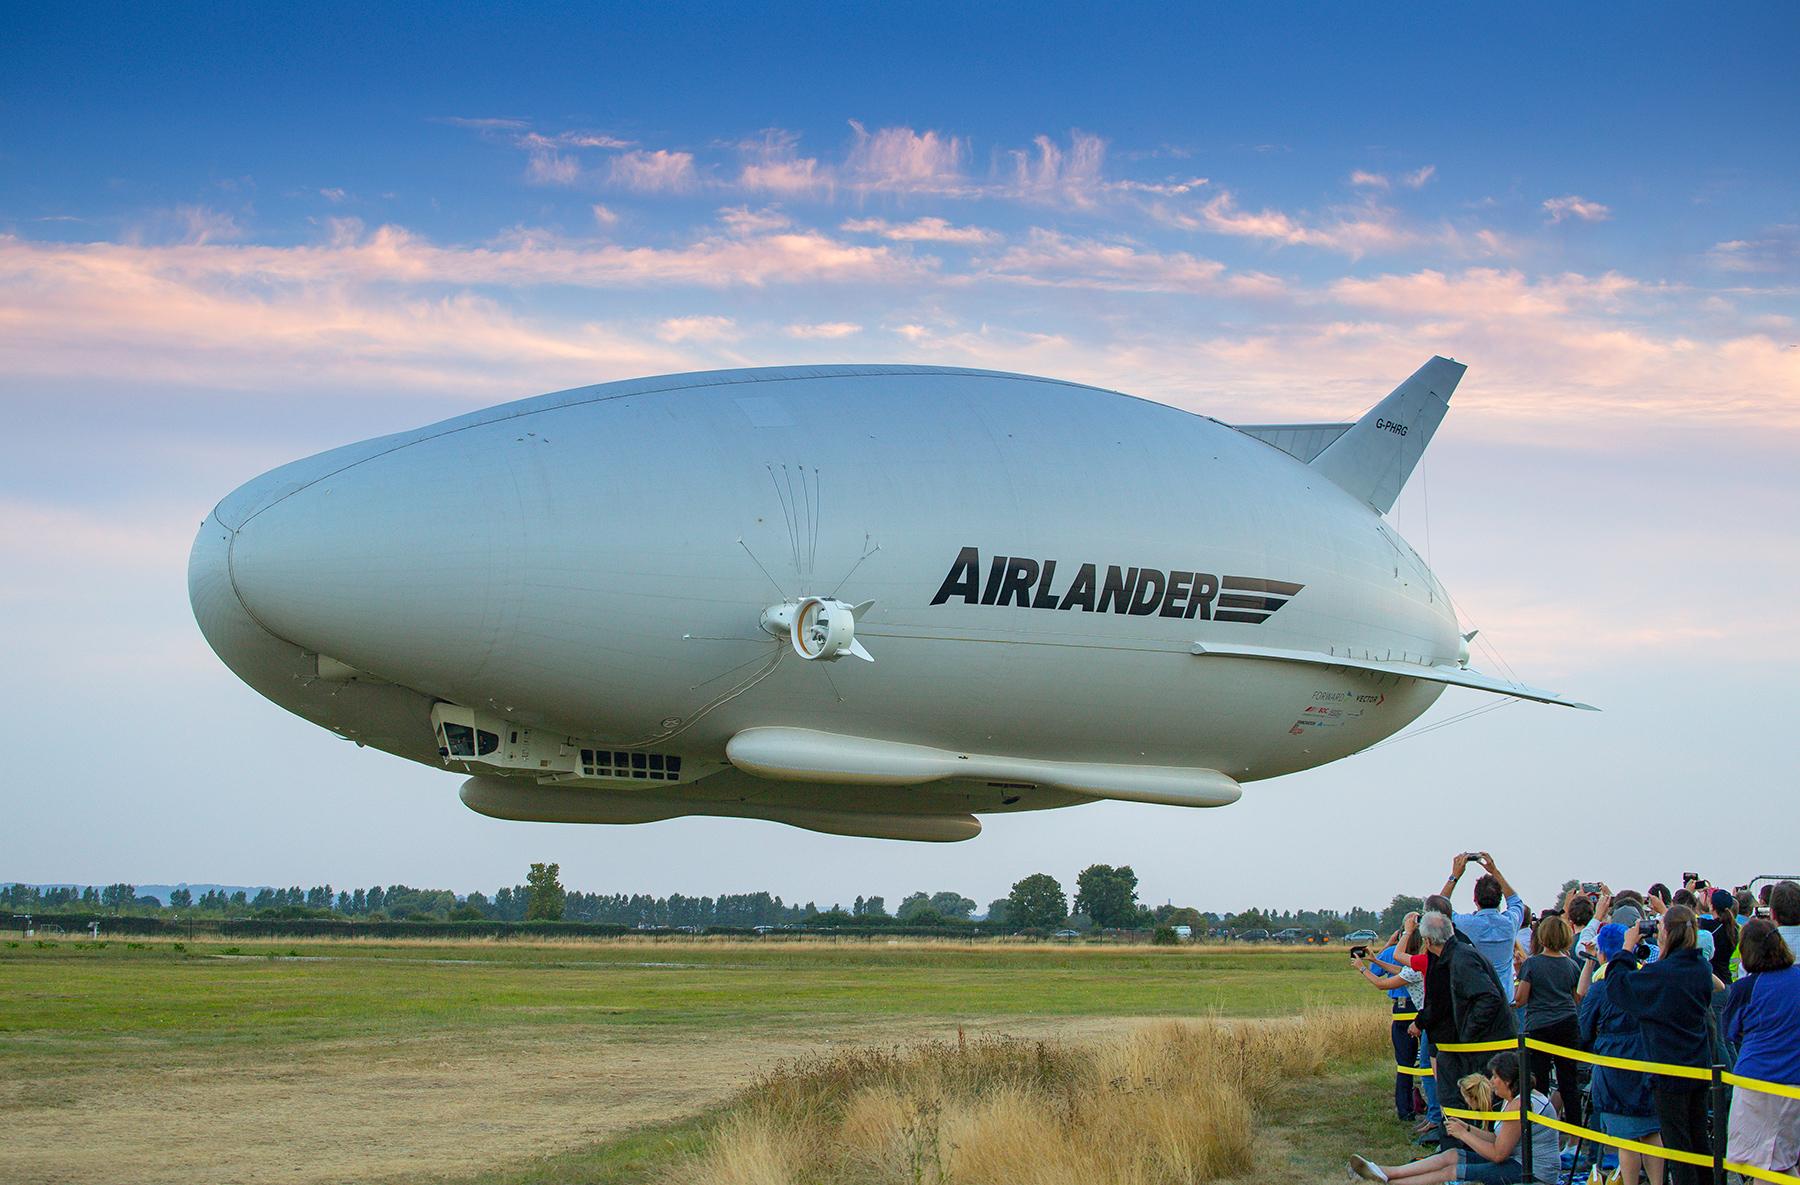 Airship Hybrid Air Vehicles OceanSky cruises